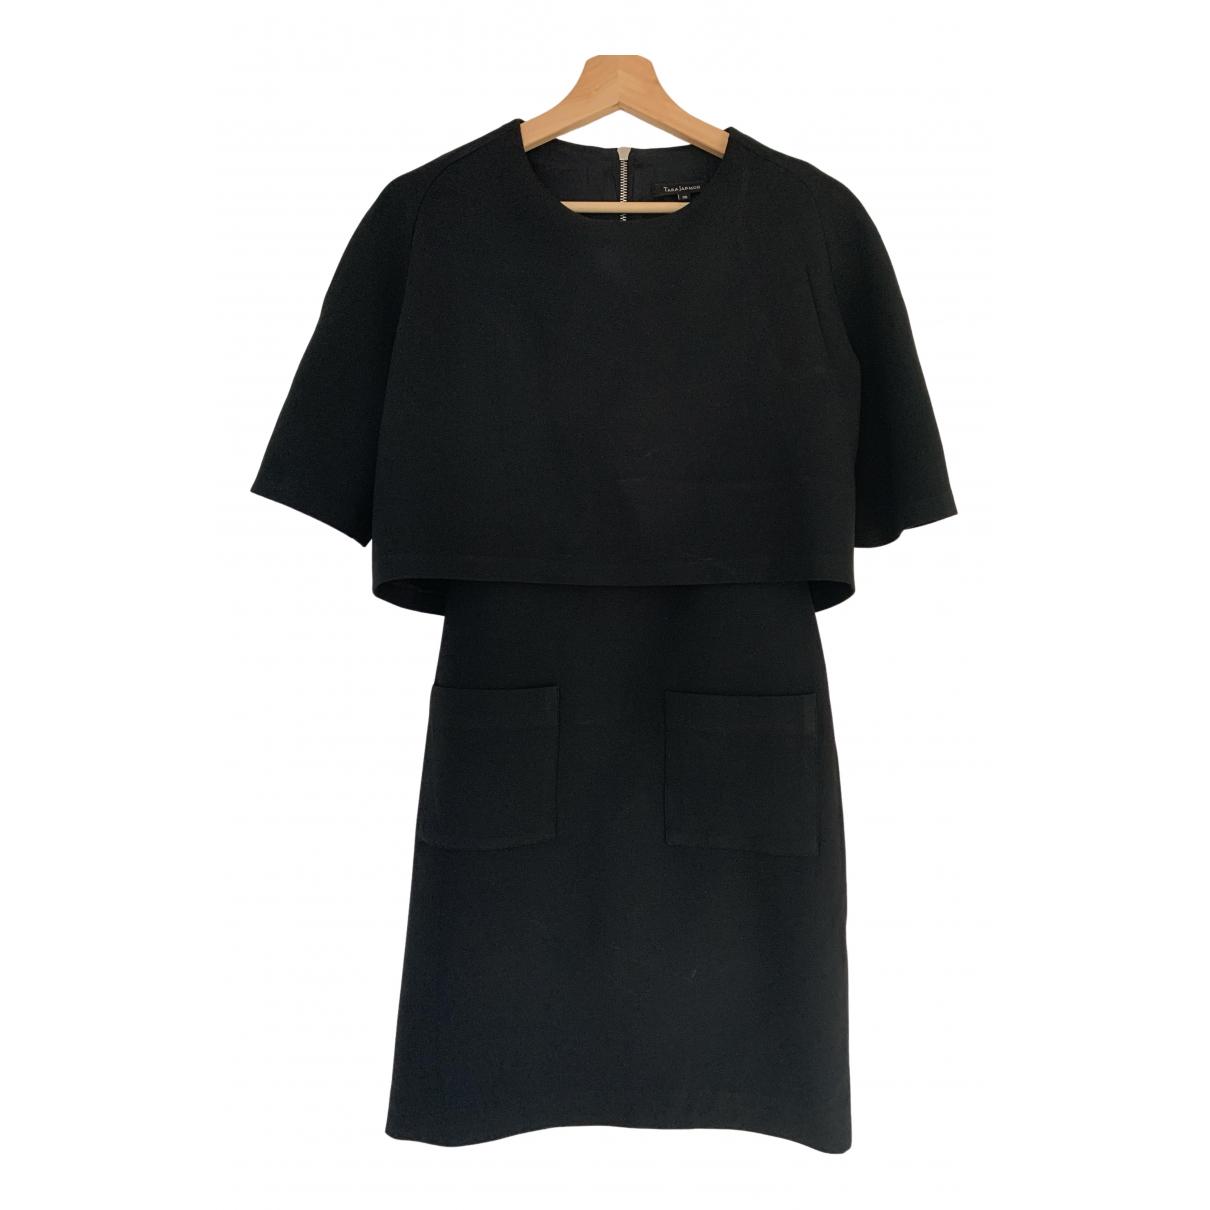 Tara Jarmon \N Kleid in  Schwarz Polyester